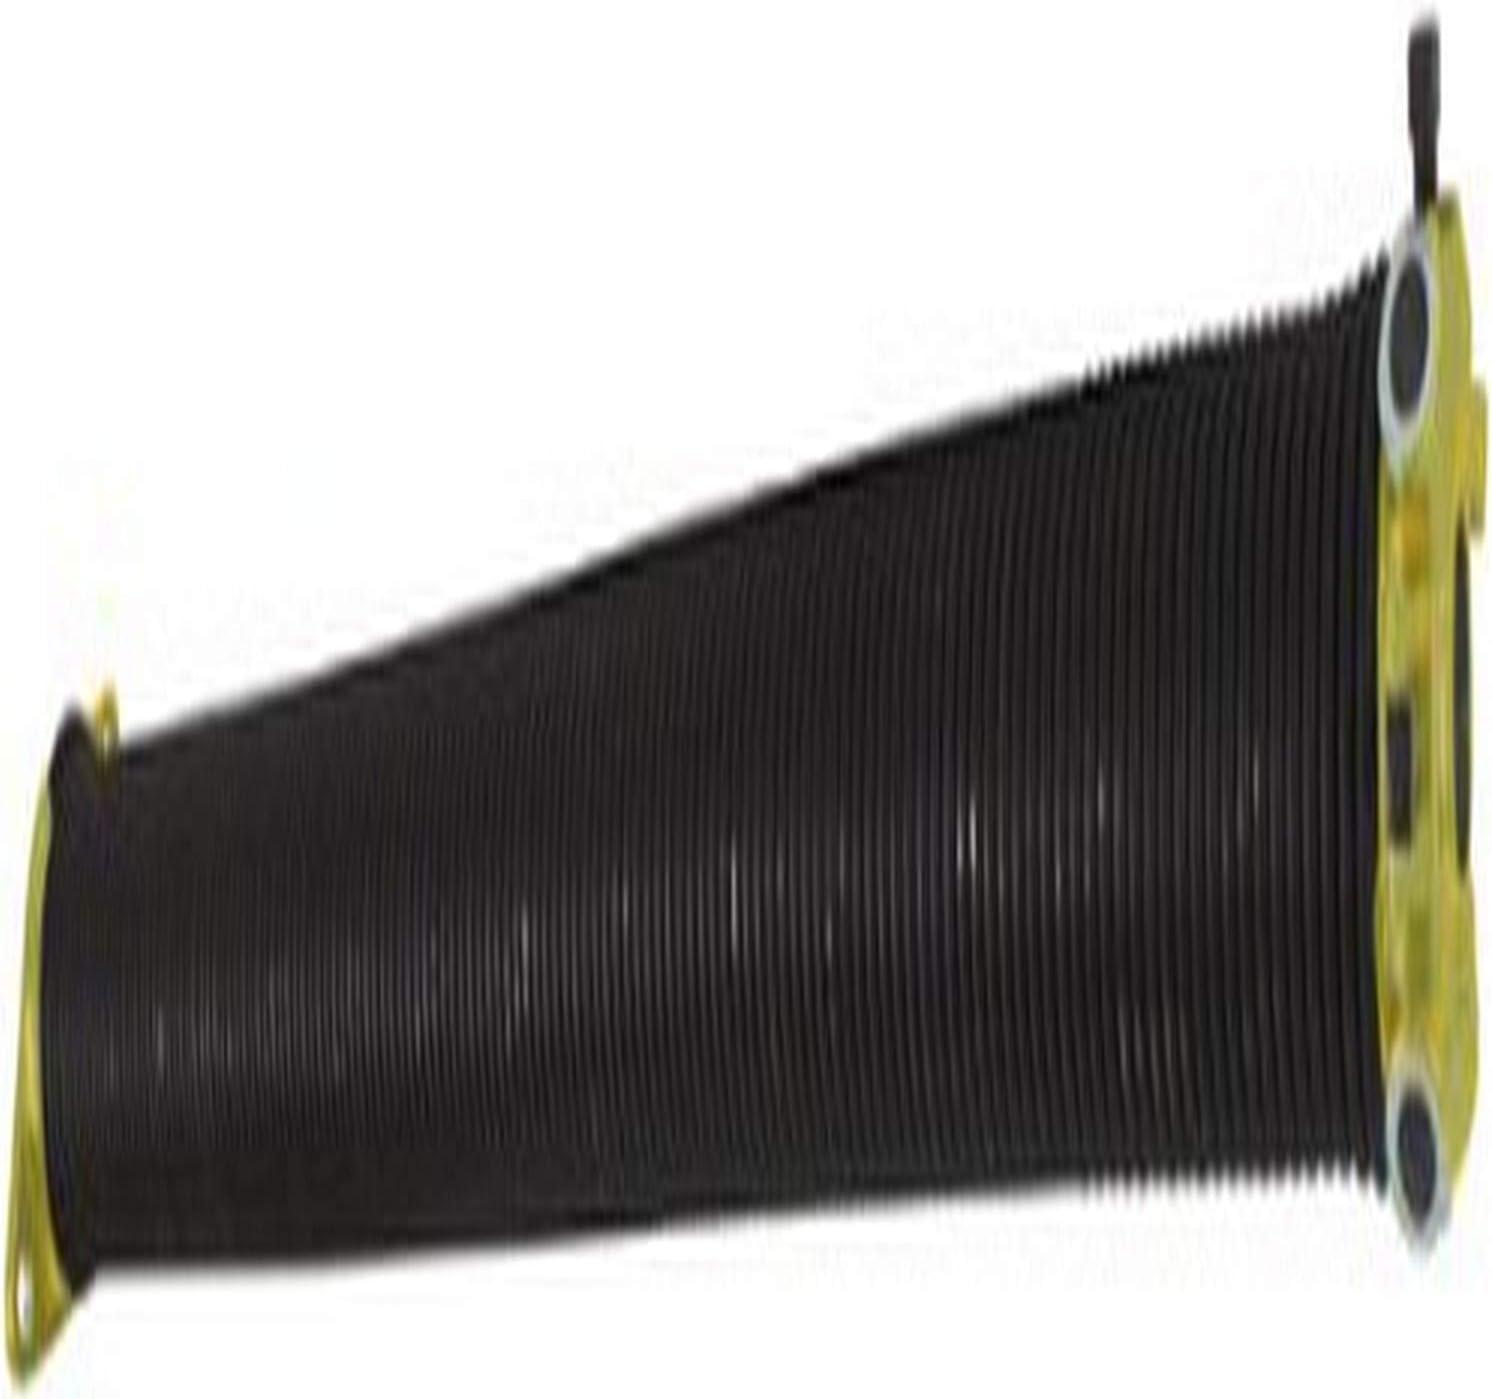 National Hardware N281-220 7683 Right Wind Torsion Spring in Plain Steel